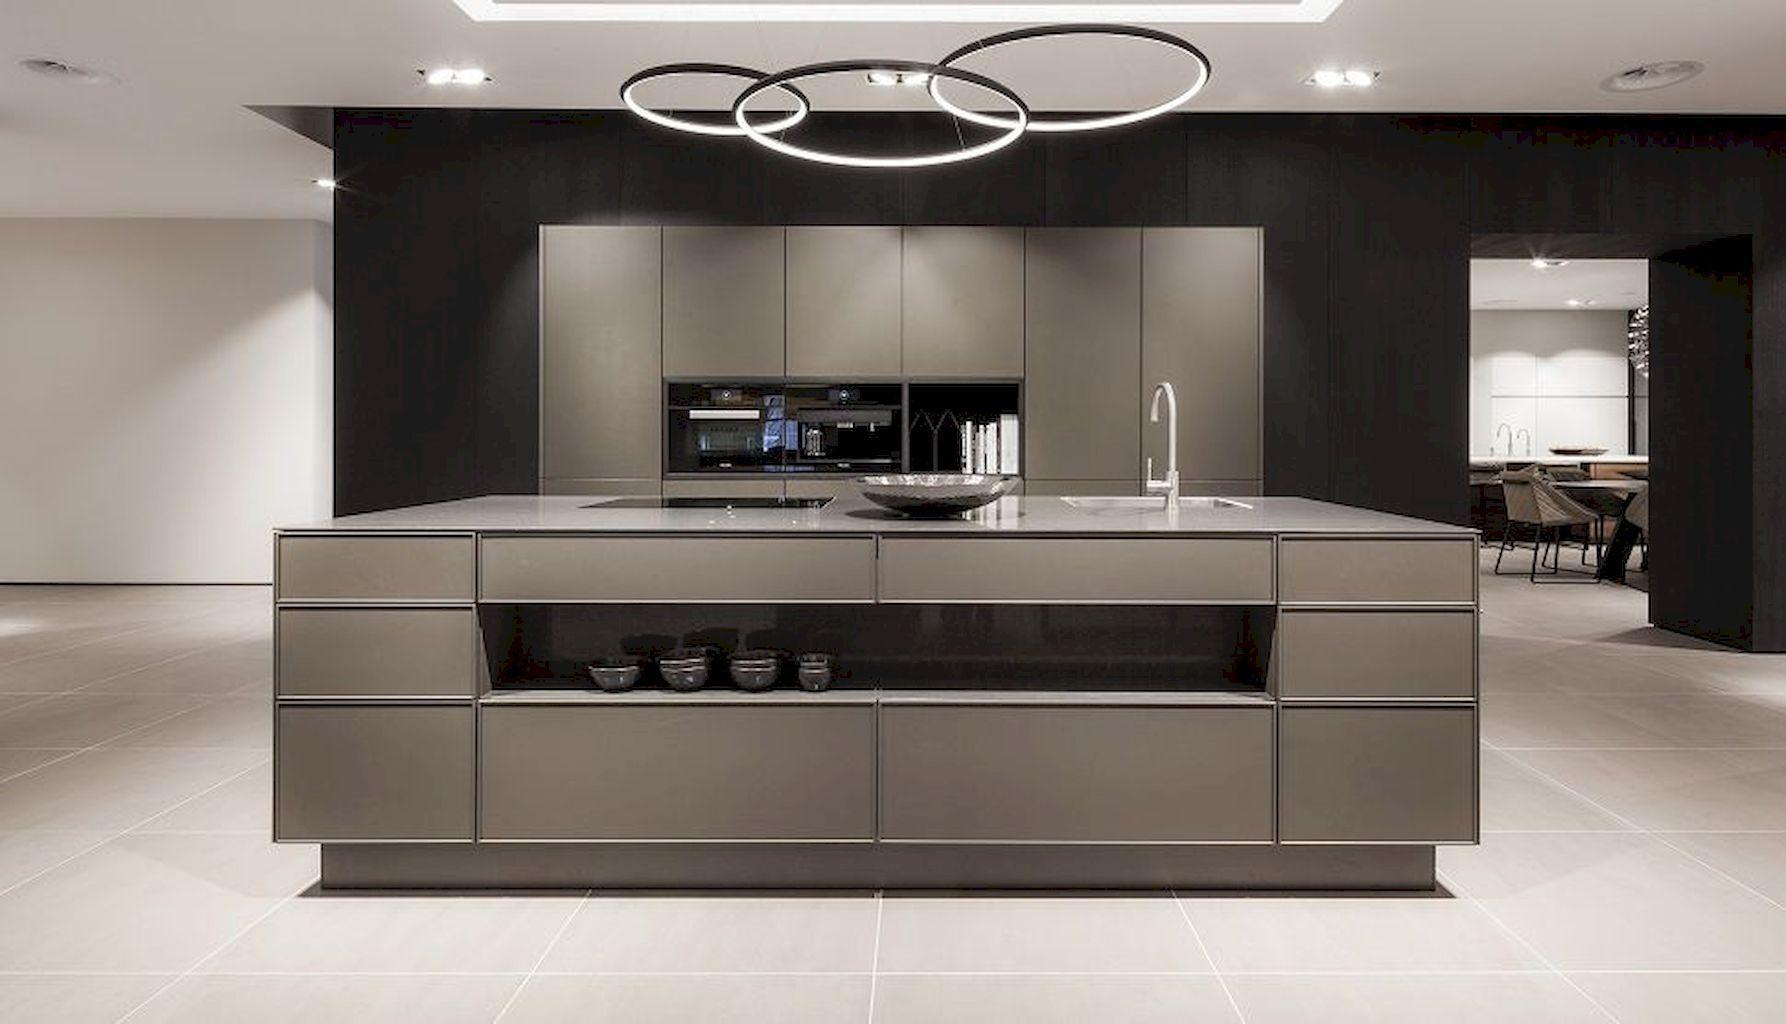 Gorgeous Fabulous Modern Kitchen Sets on Simplicity, Efficiency